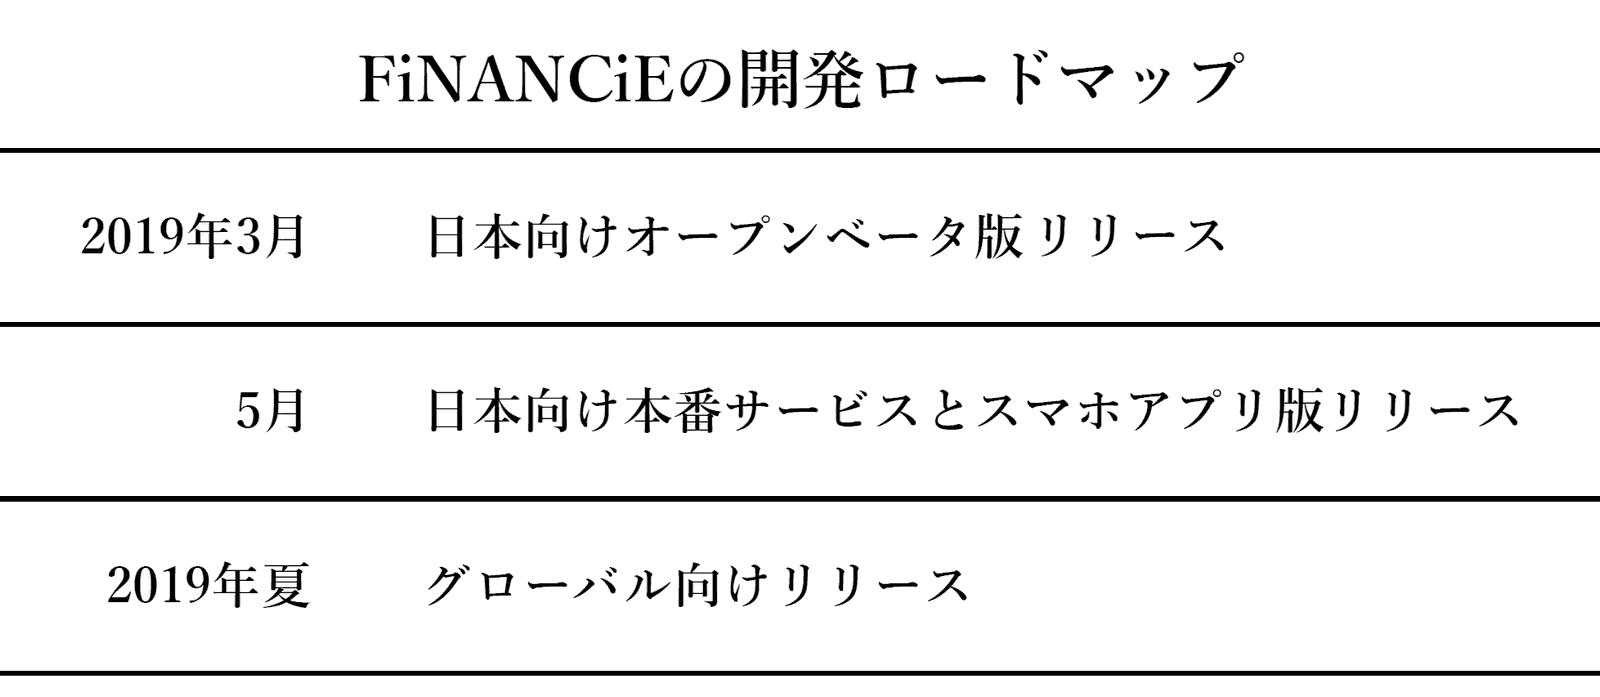 FiNANCiEの開発ロードマップ